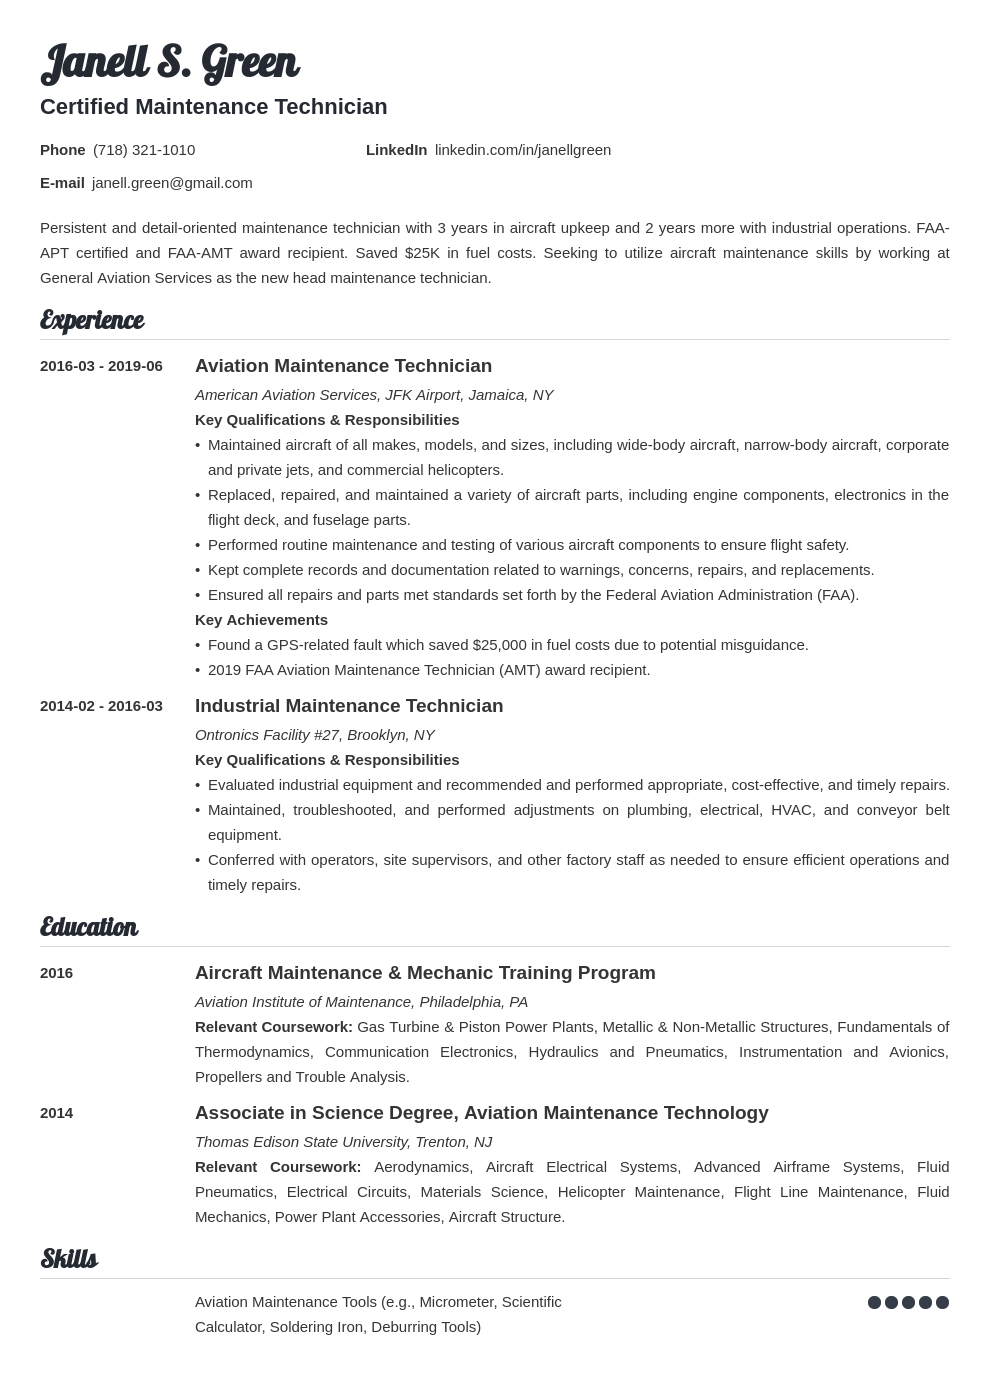 Maintenance Technician Resume Example Template Valera Resume Examples Job Resume Examples Home Health Aide